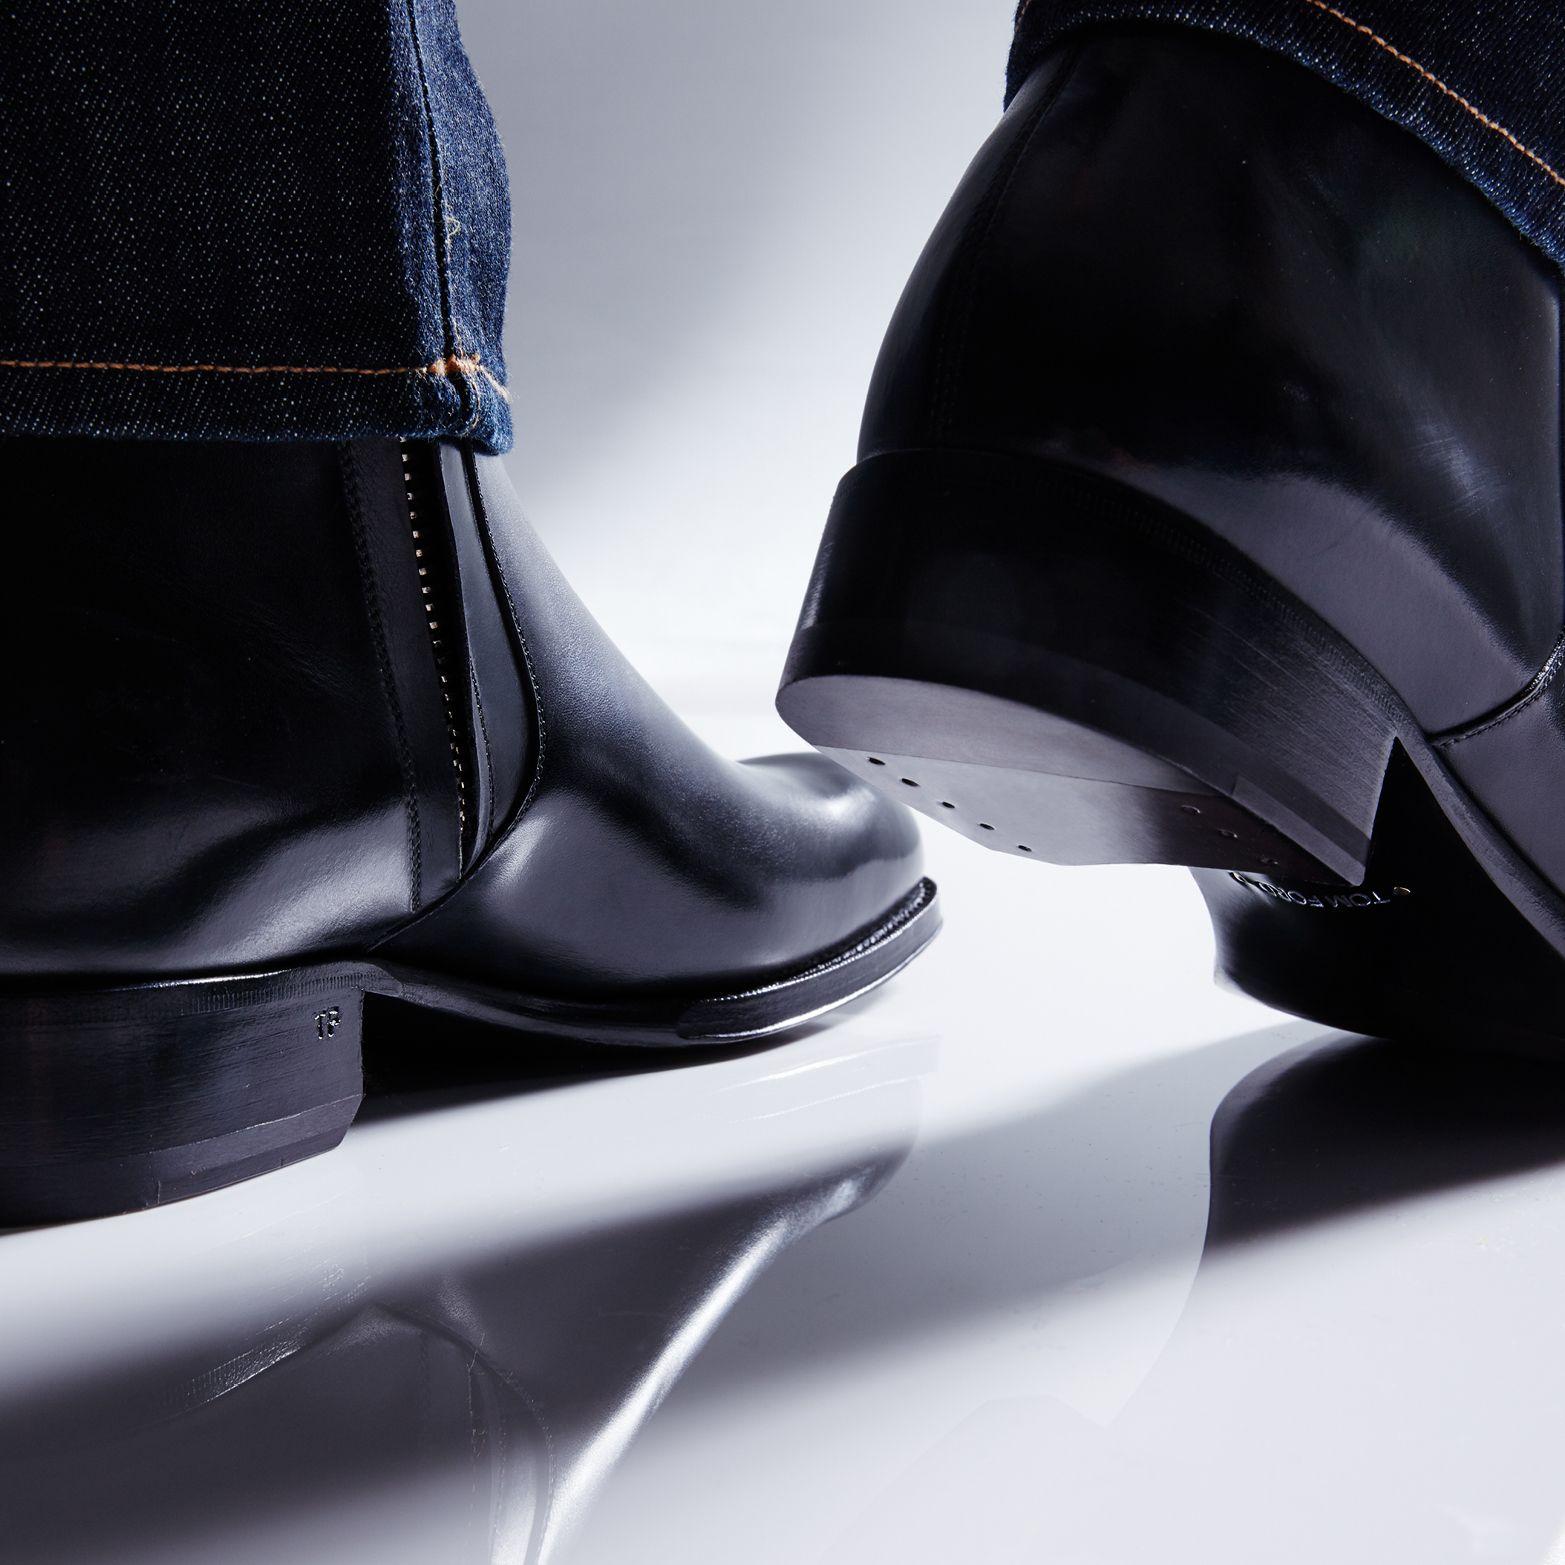 EDGAR LEATHER ZIP BOOT | Boots, Tom